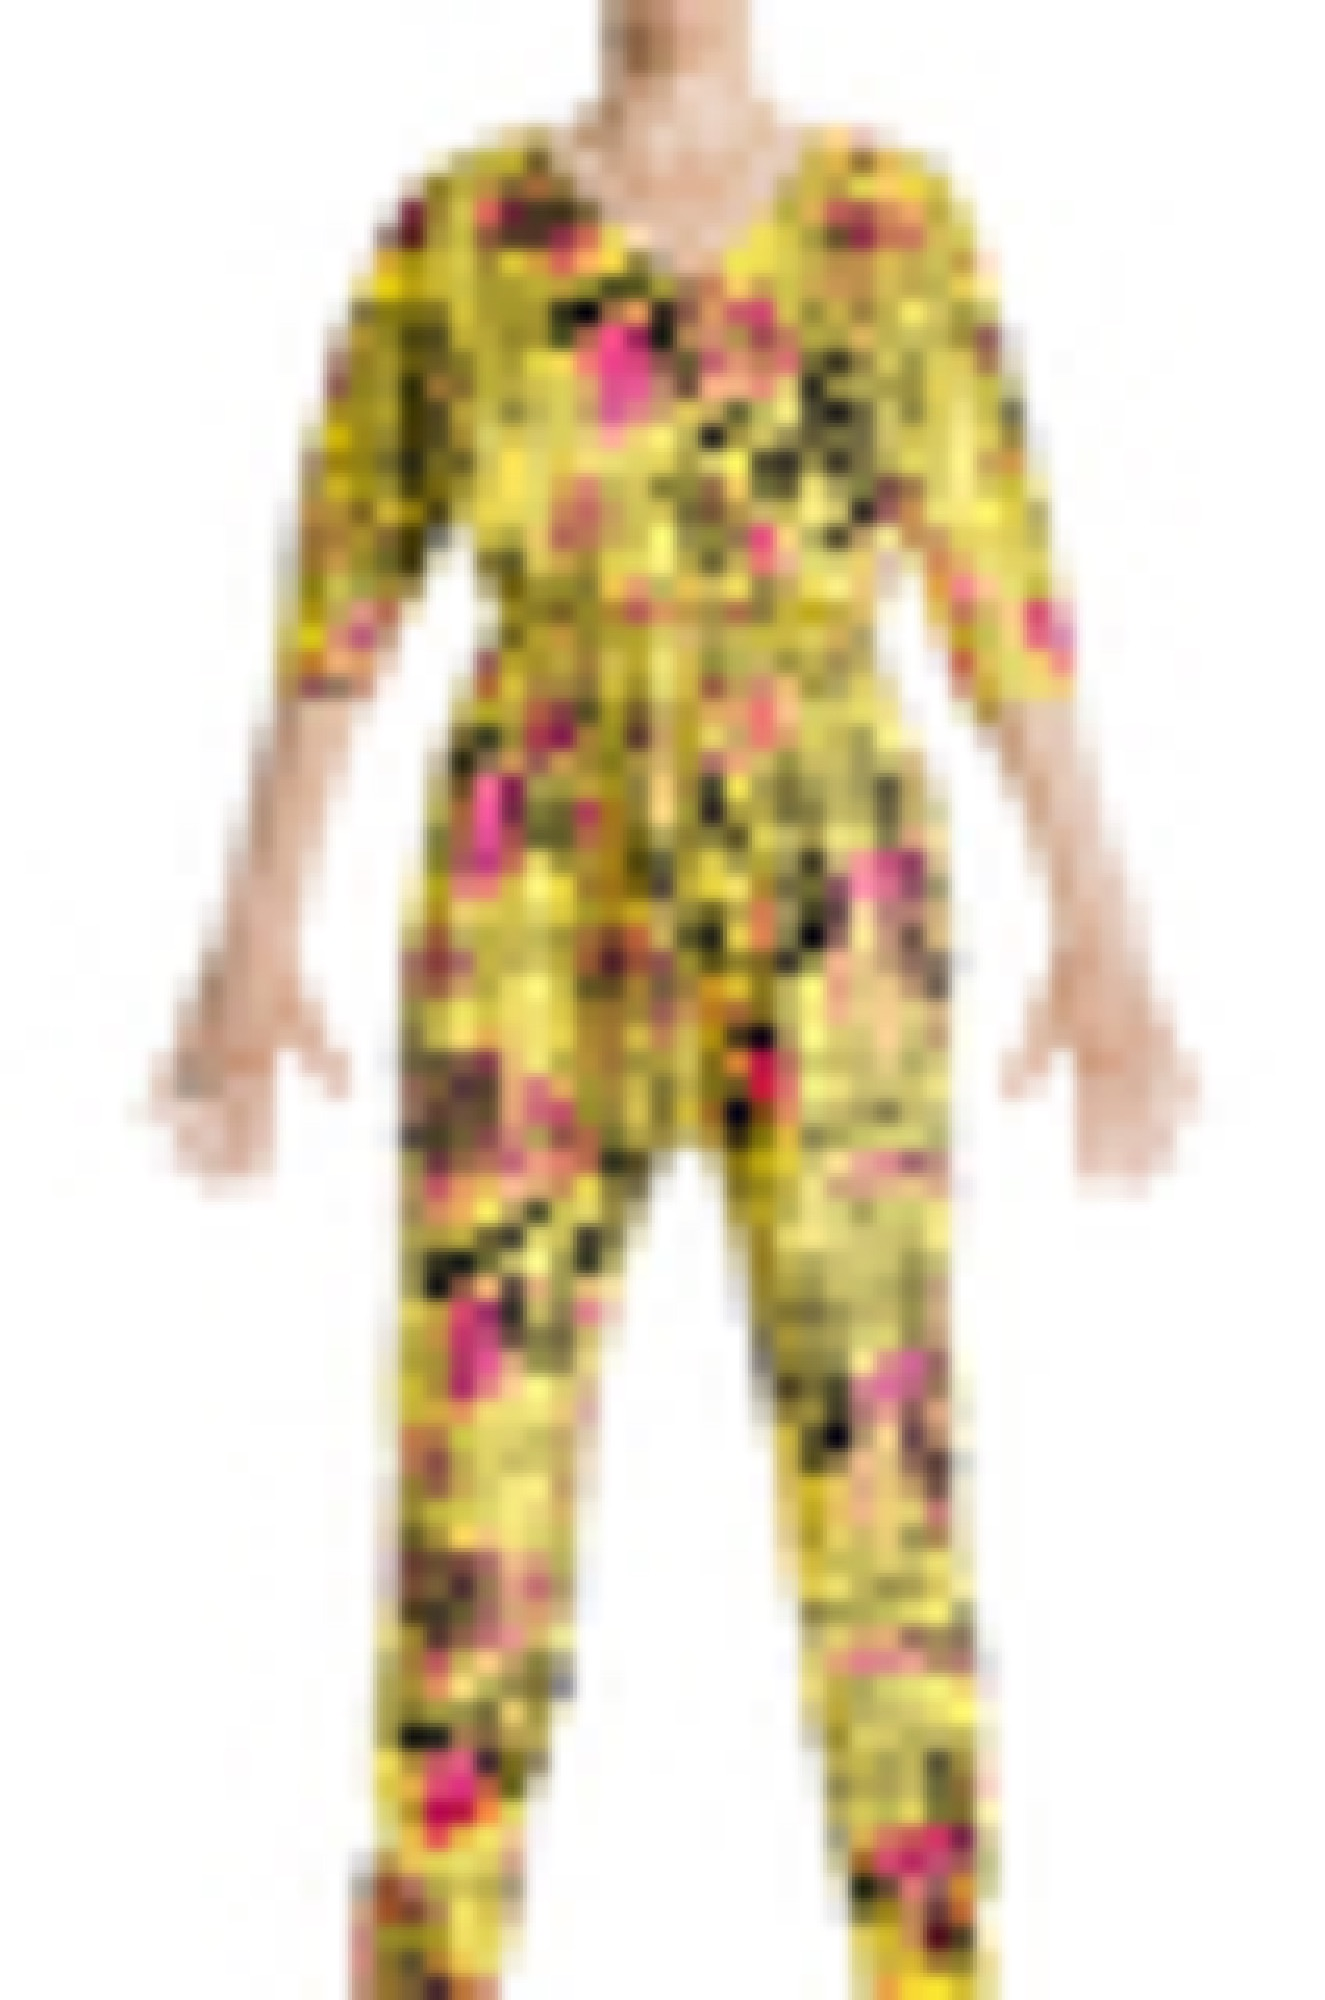 erica_jacobson_fabricprint_2